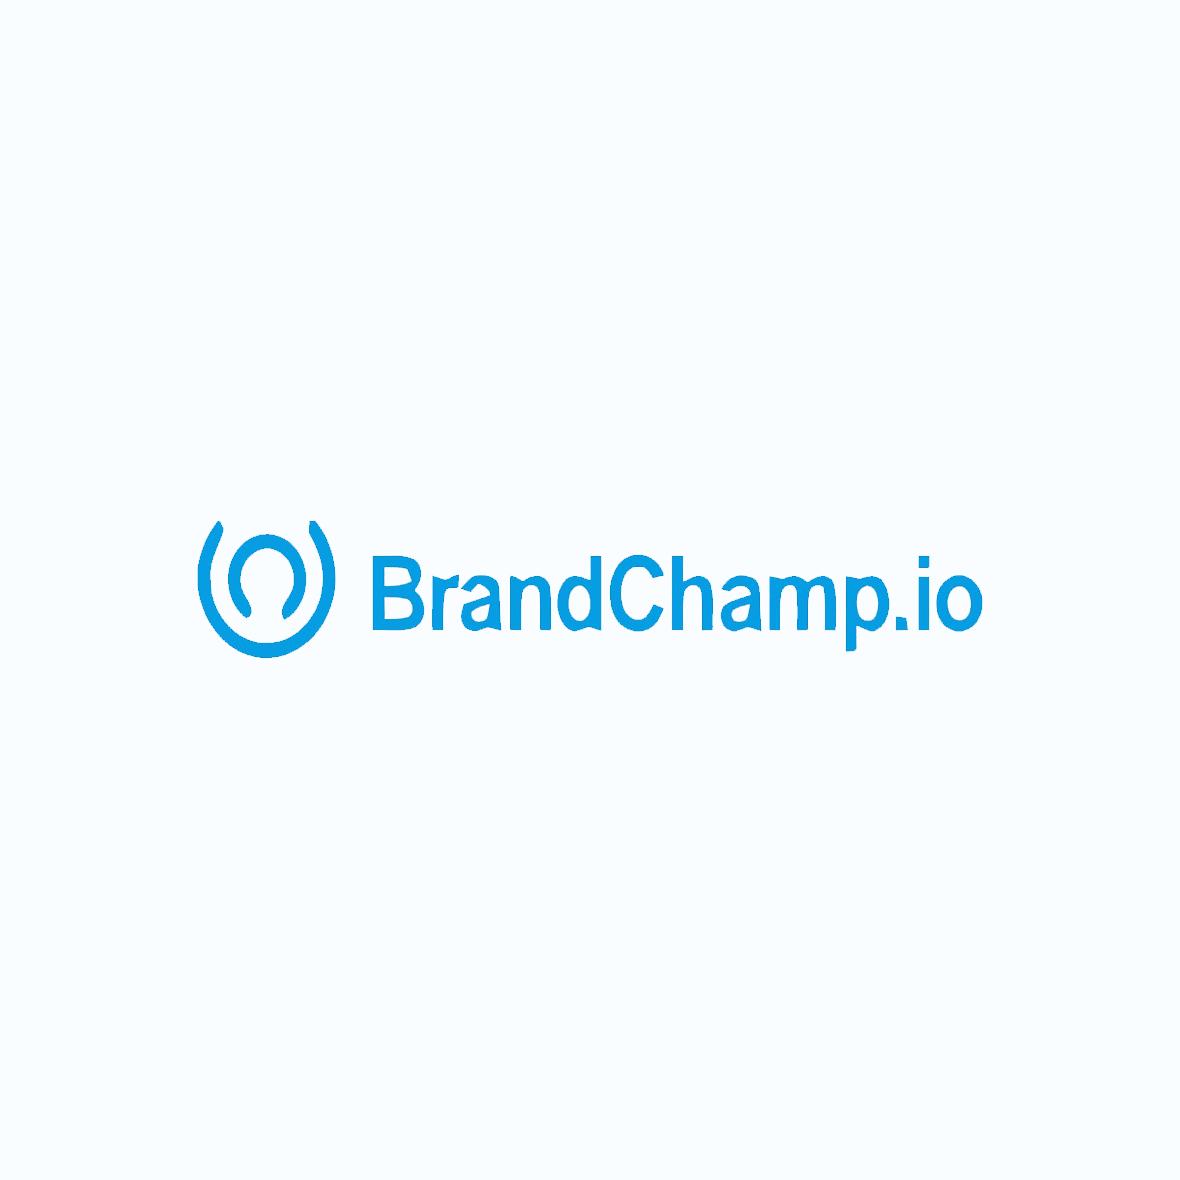 BrandChamp